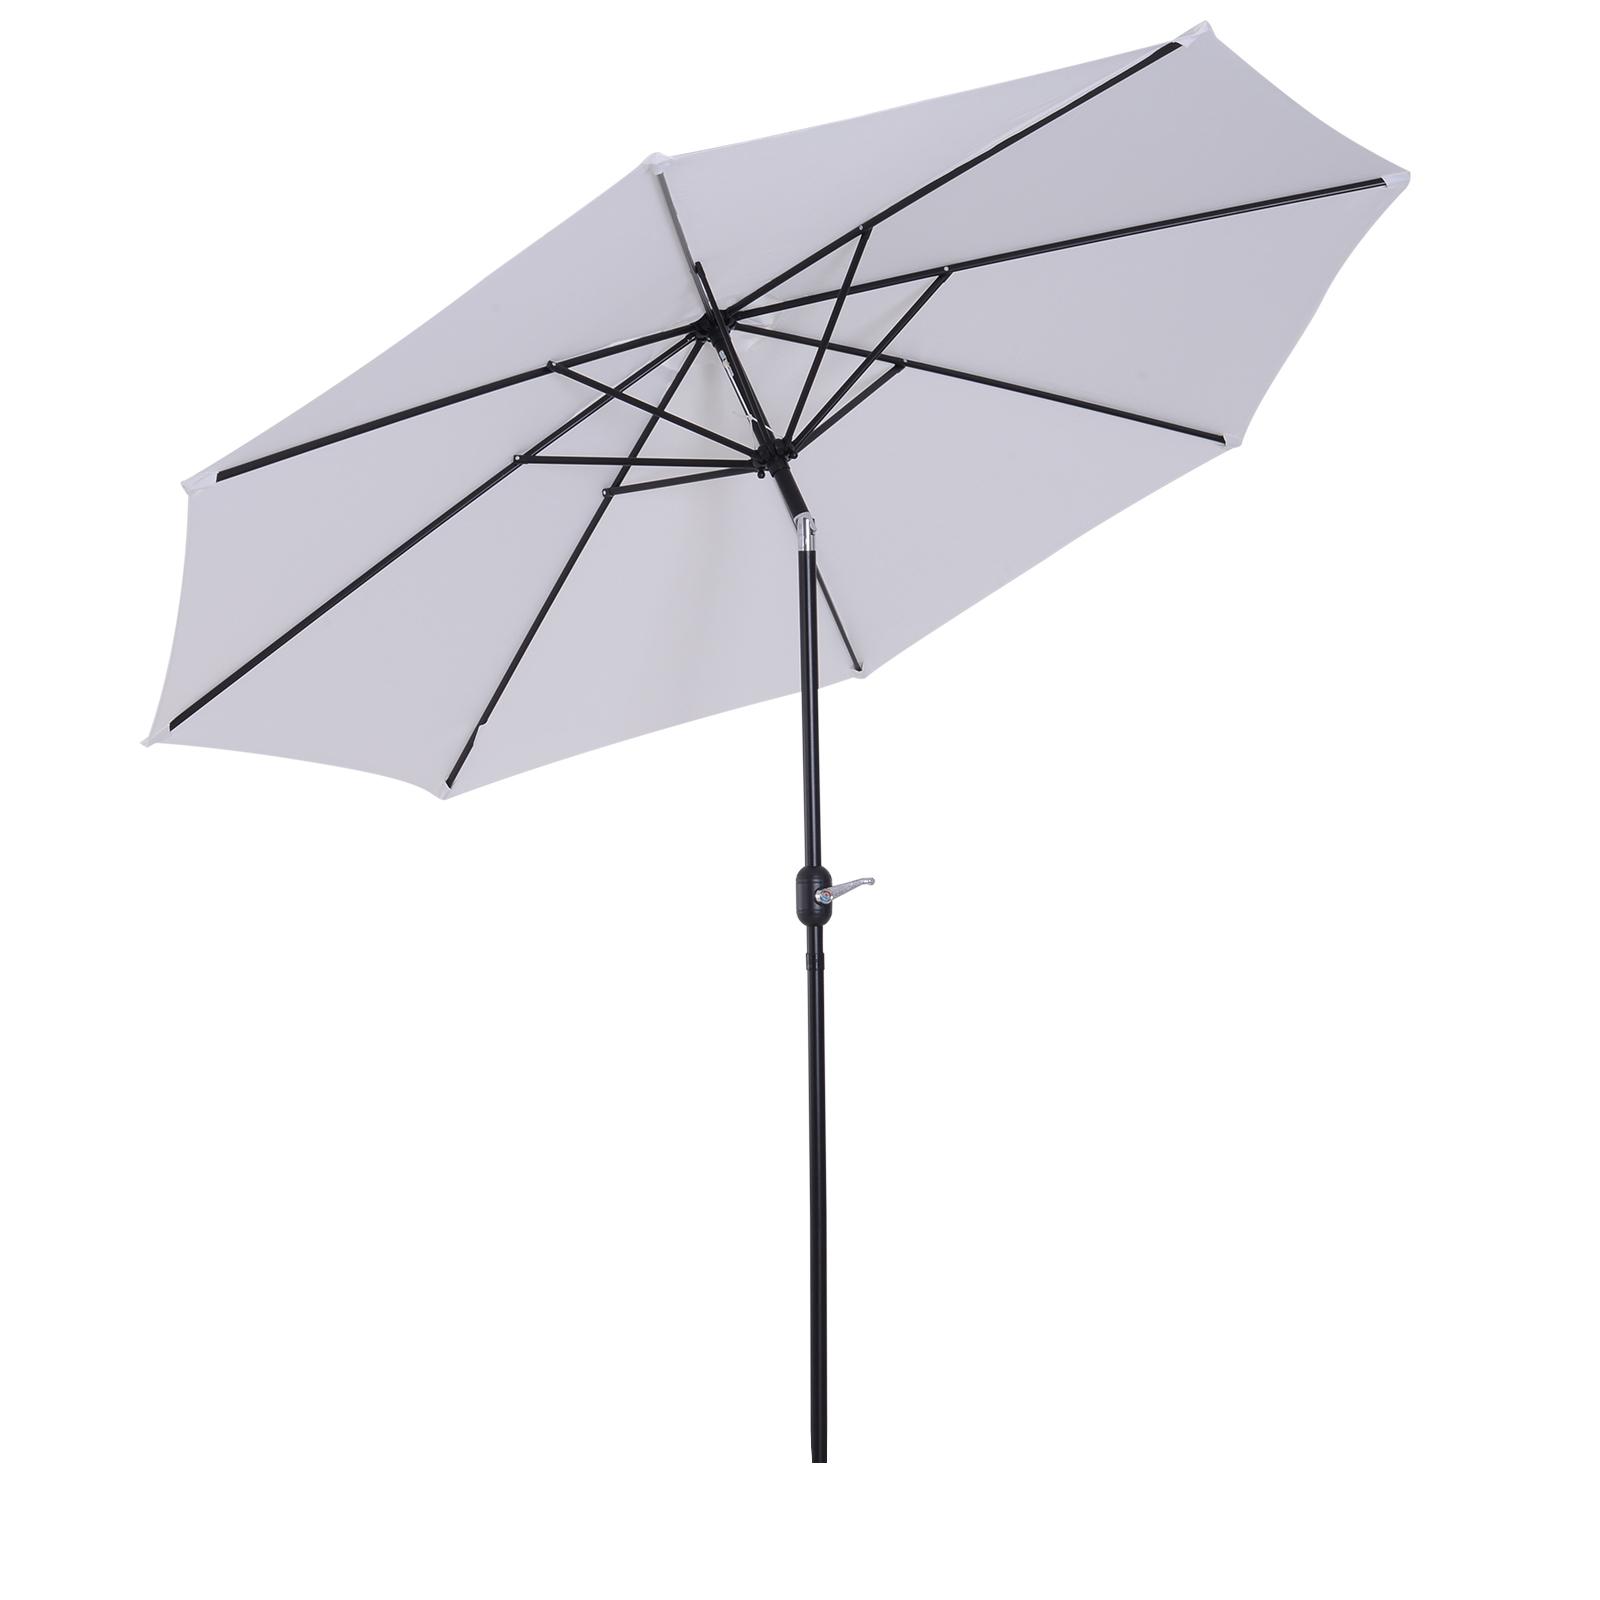 Parasol en aluminium rond inclinable blanc